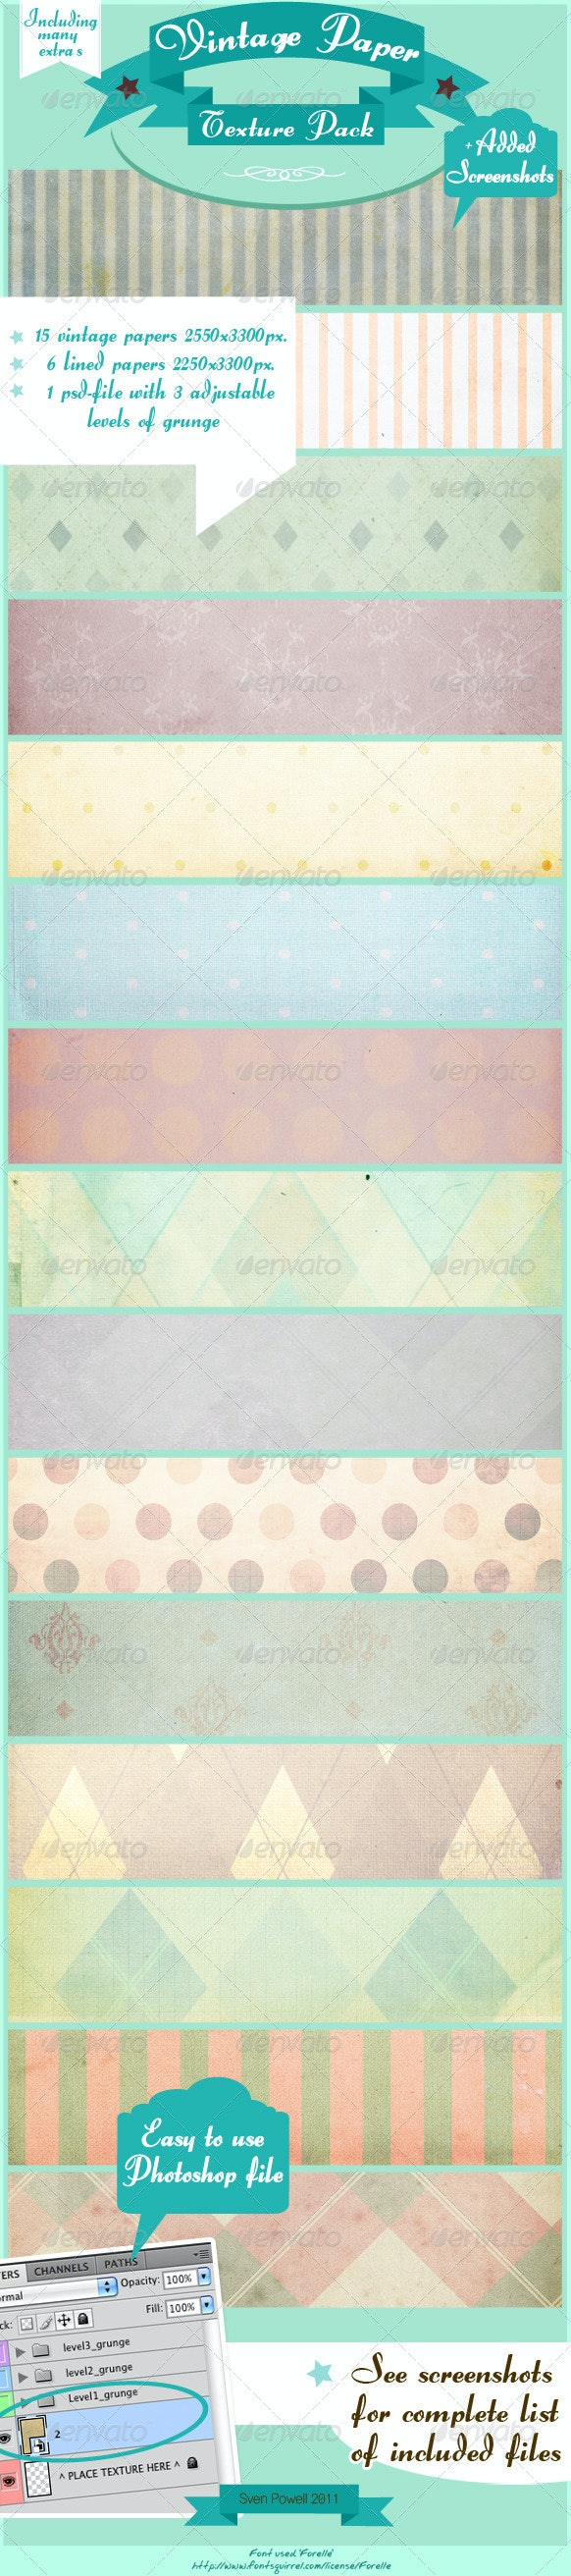 Vintage distressed paper textures - Paper Textures